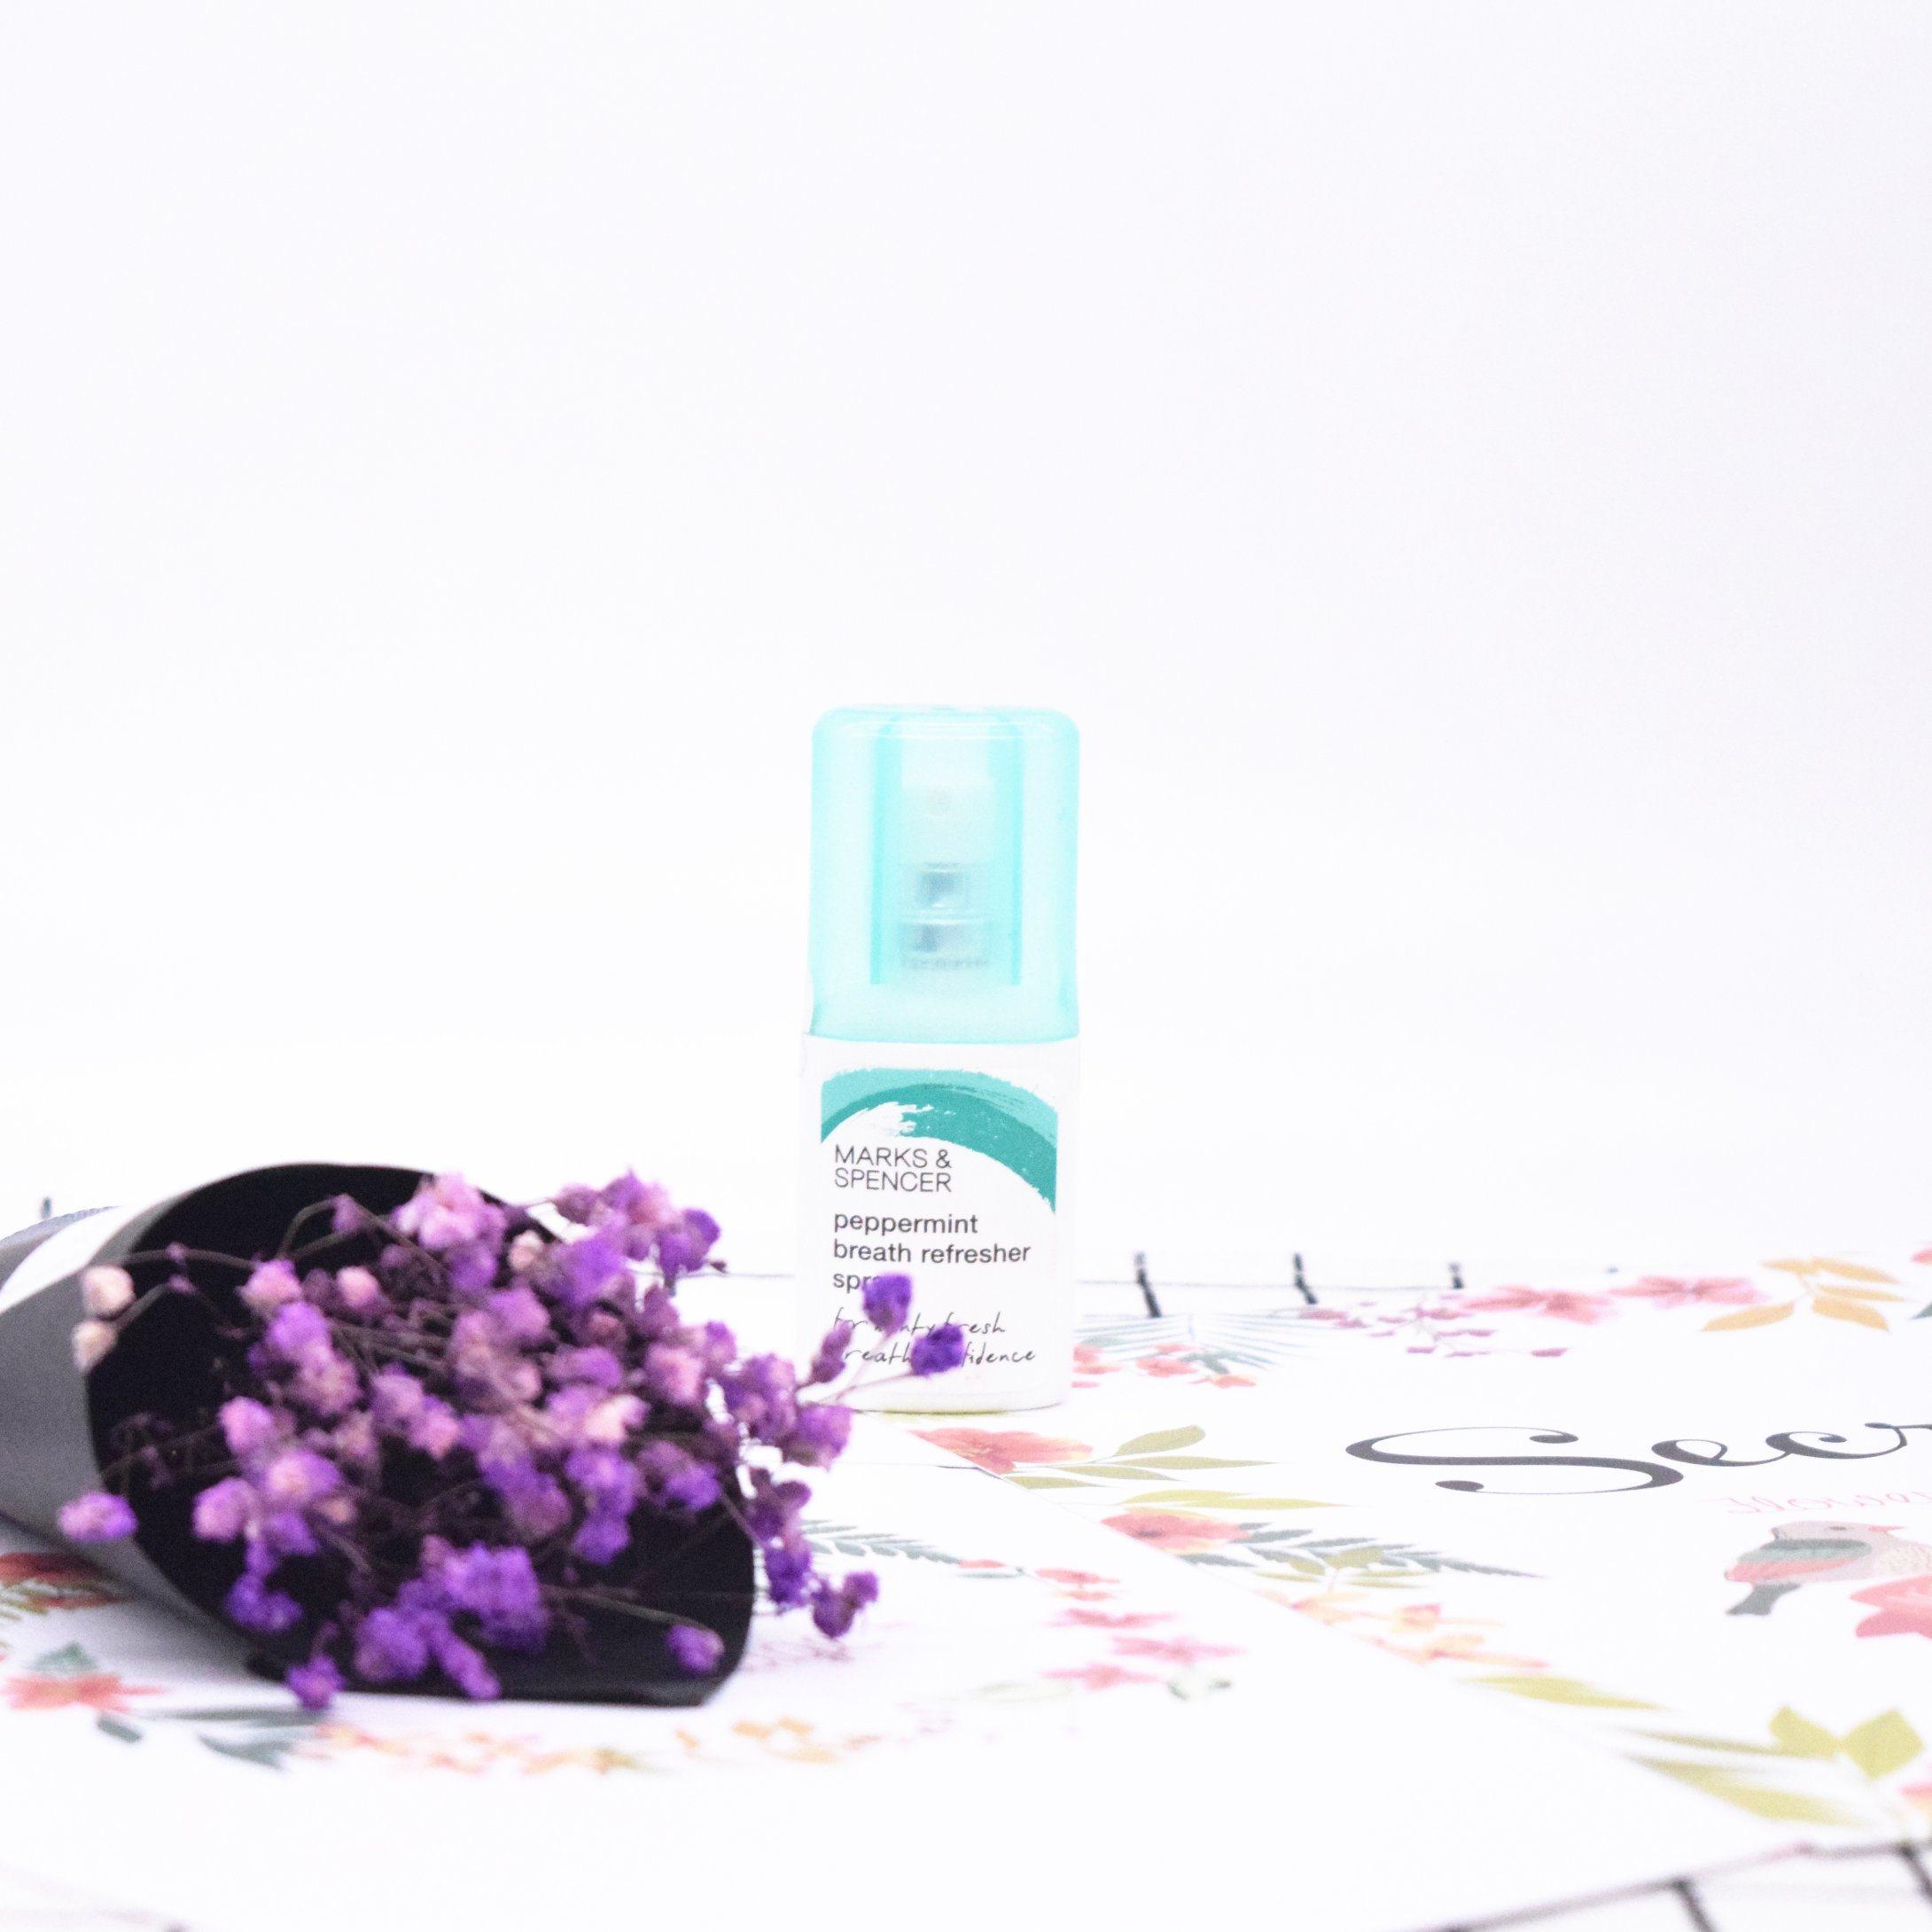 Marks & Spencer Peppermint Breath Spray